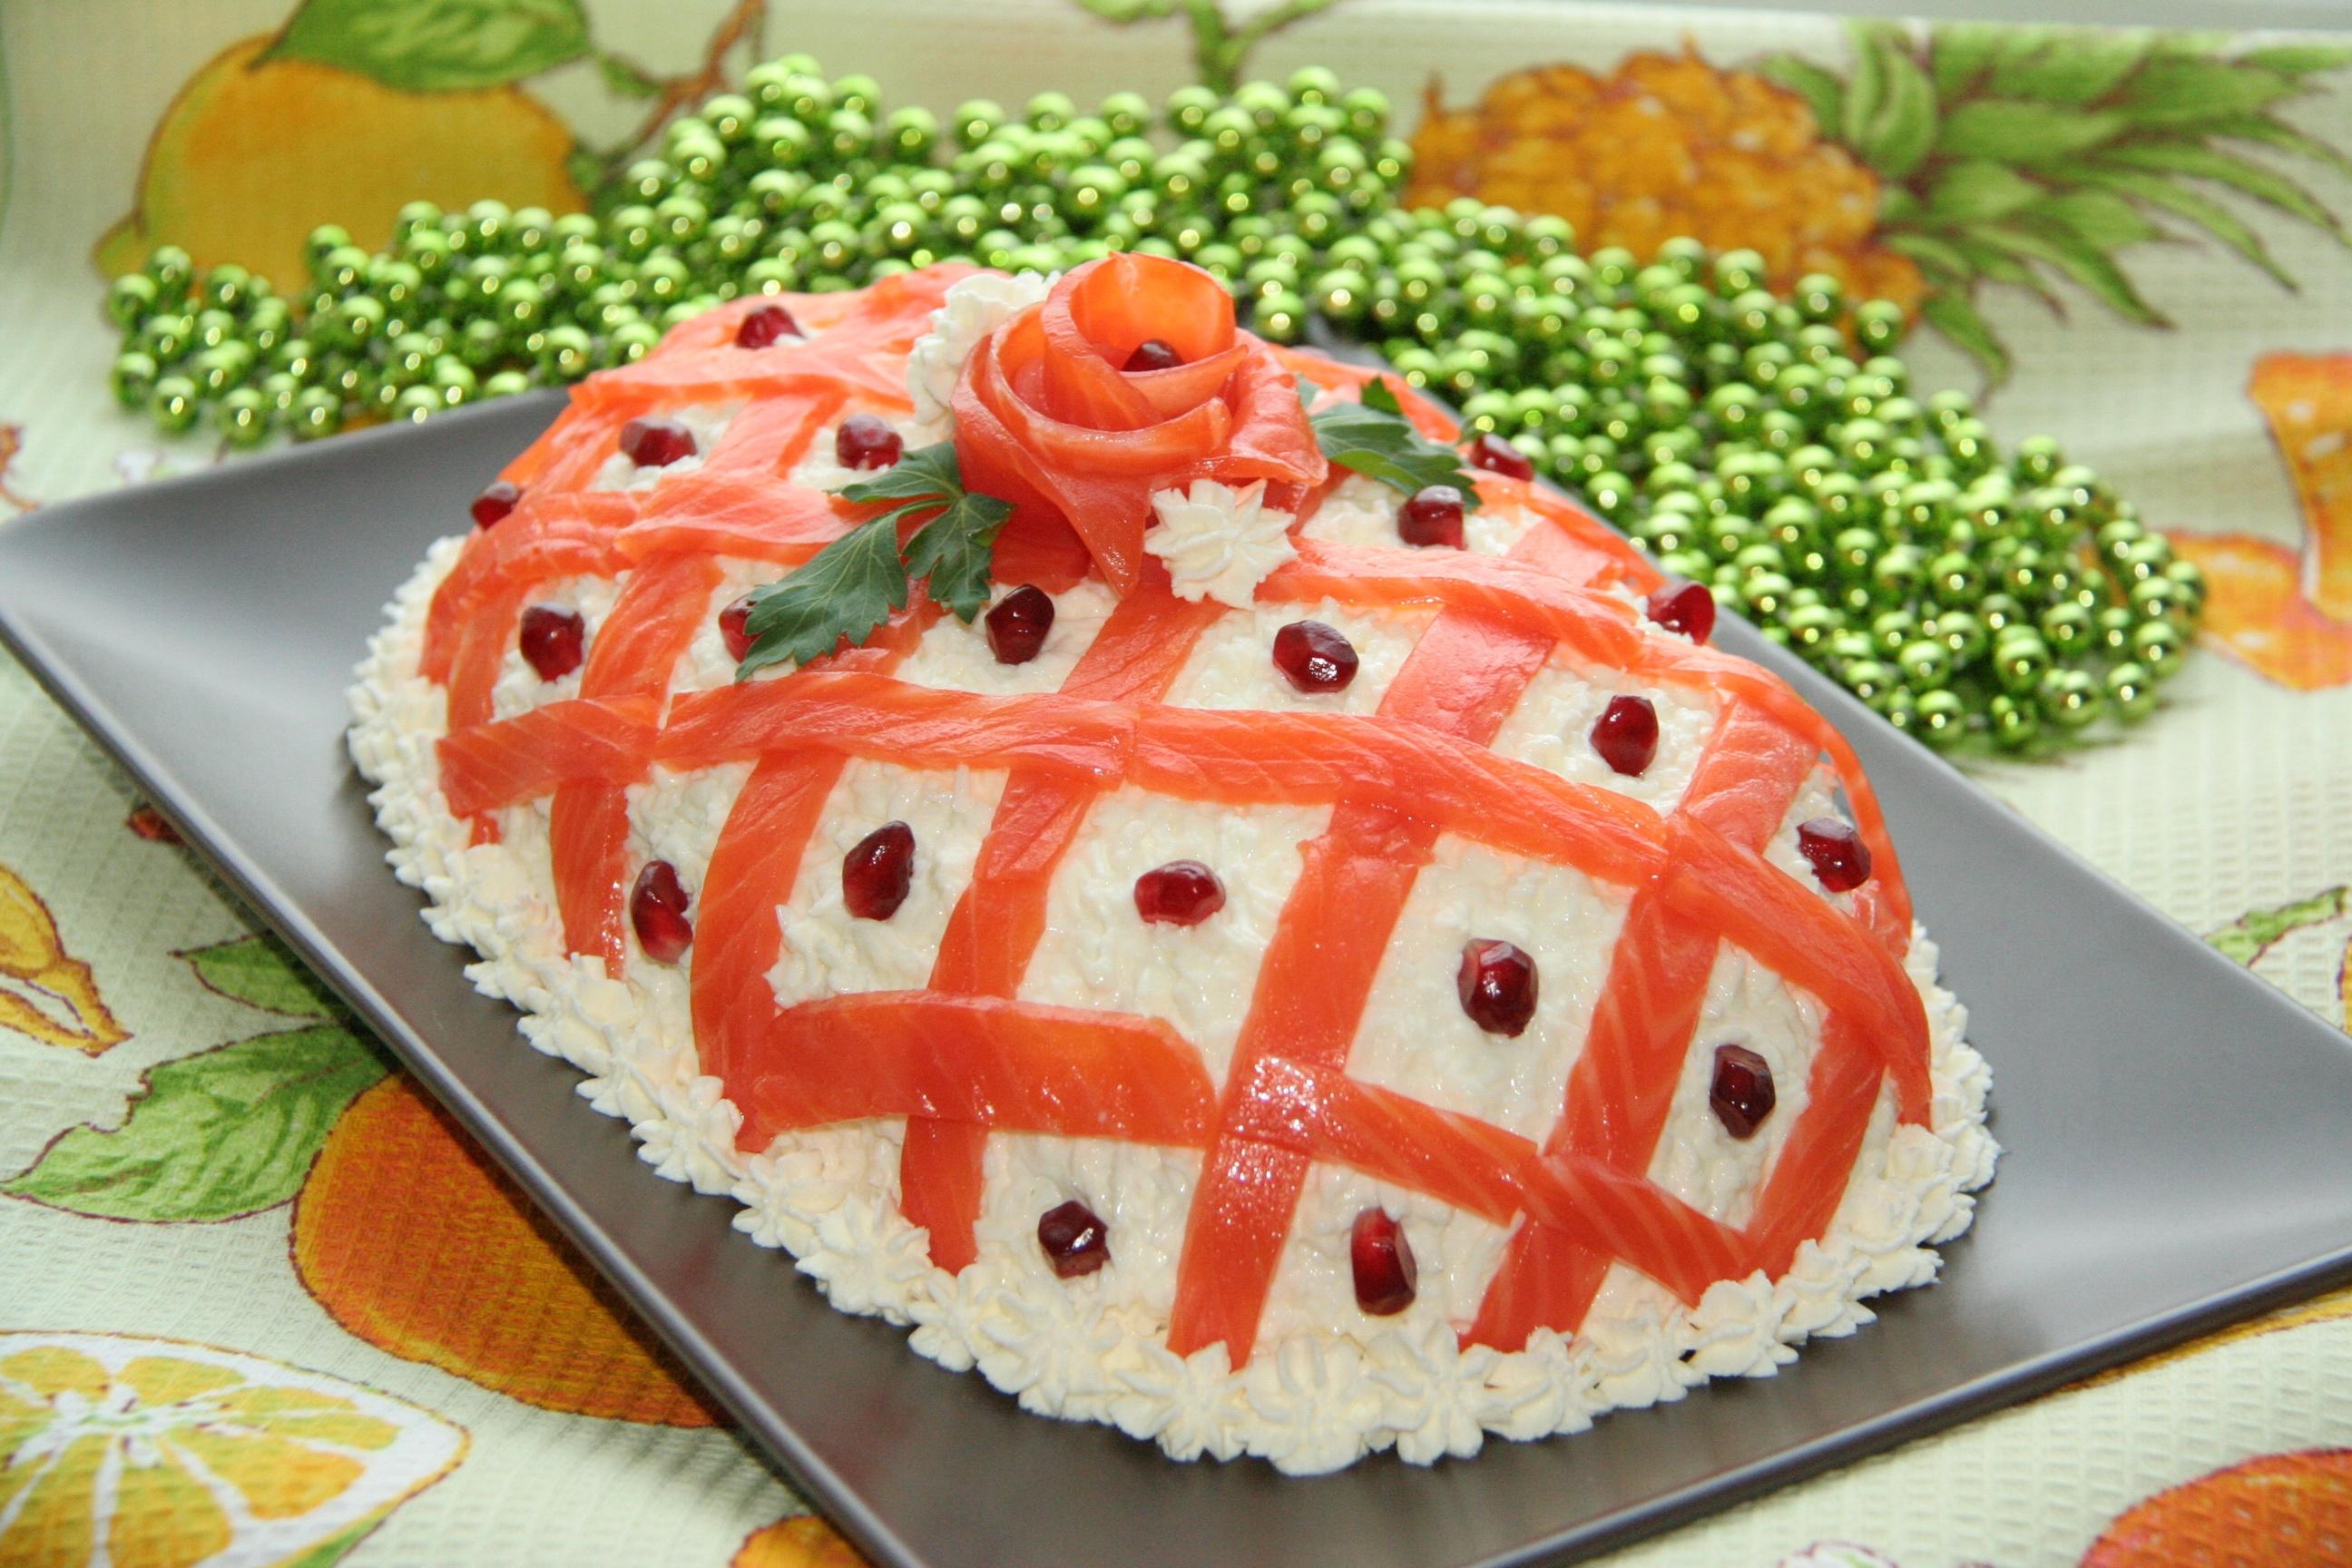 Fondos de pantalla : carne, pescado, Fruta, Fresas, pastel, ensalada ...